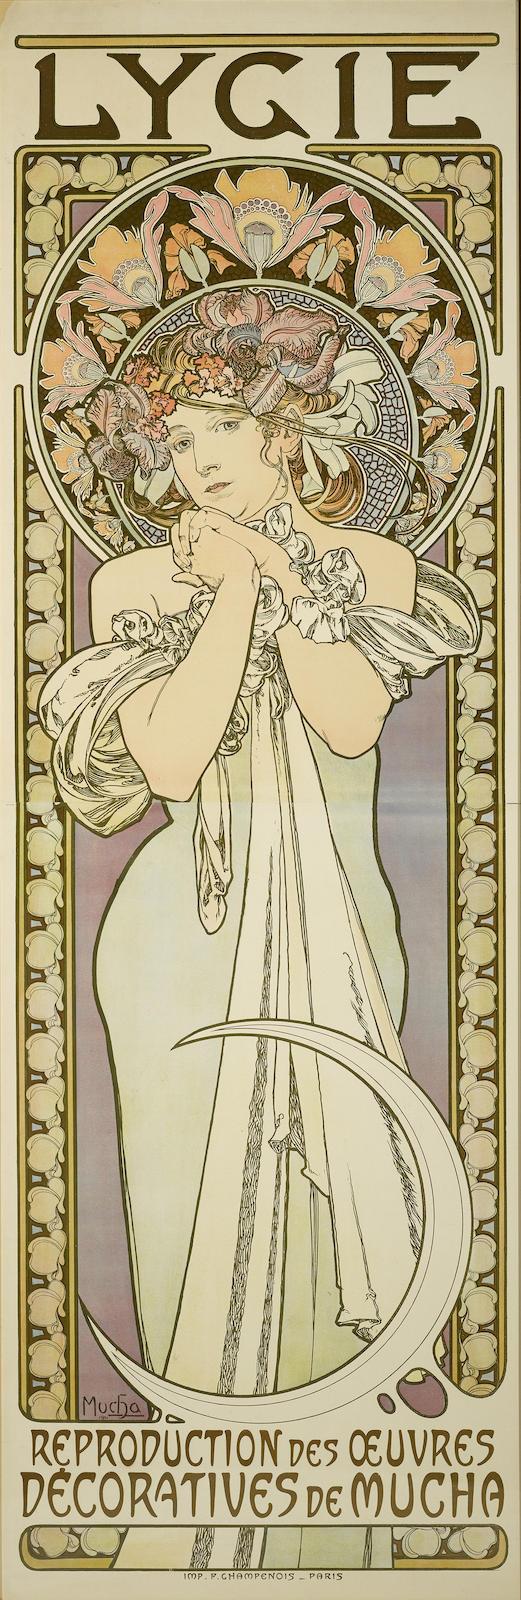 Alphonse Mucha-Lygielygie (R./W. 77)-1901